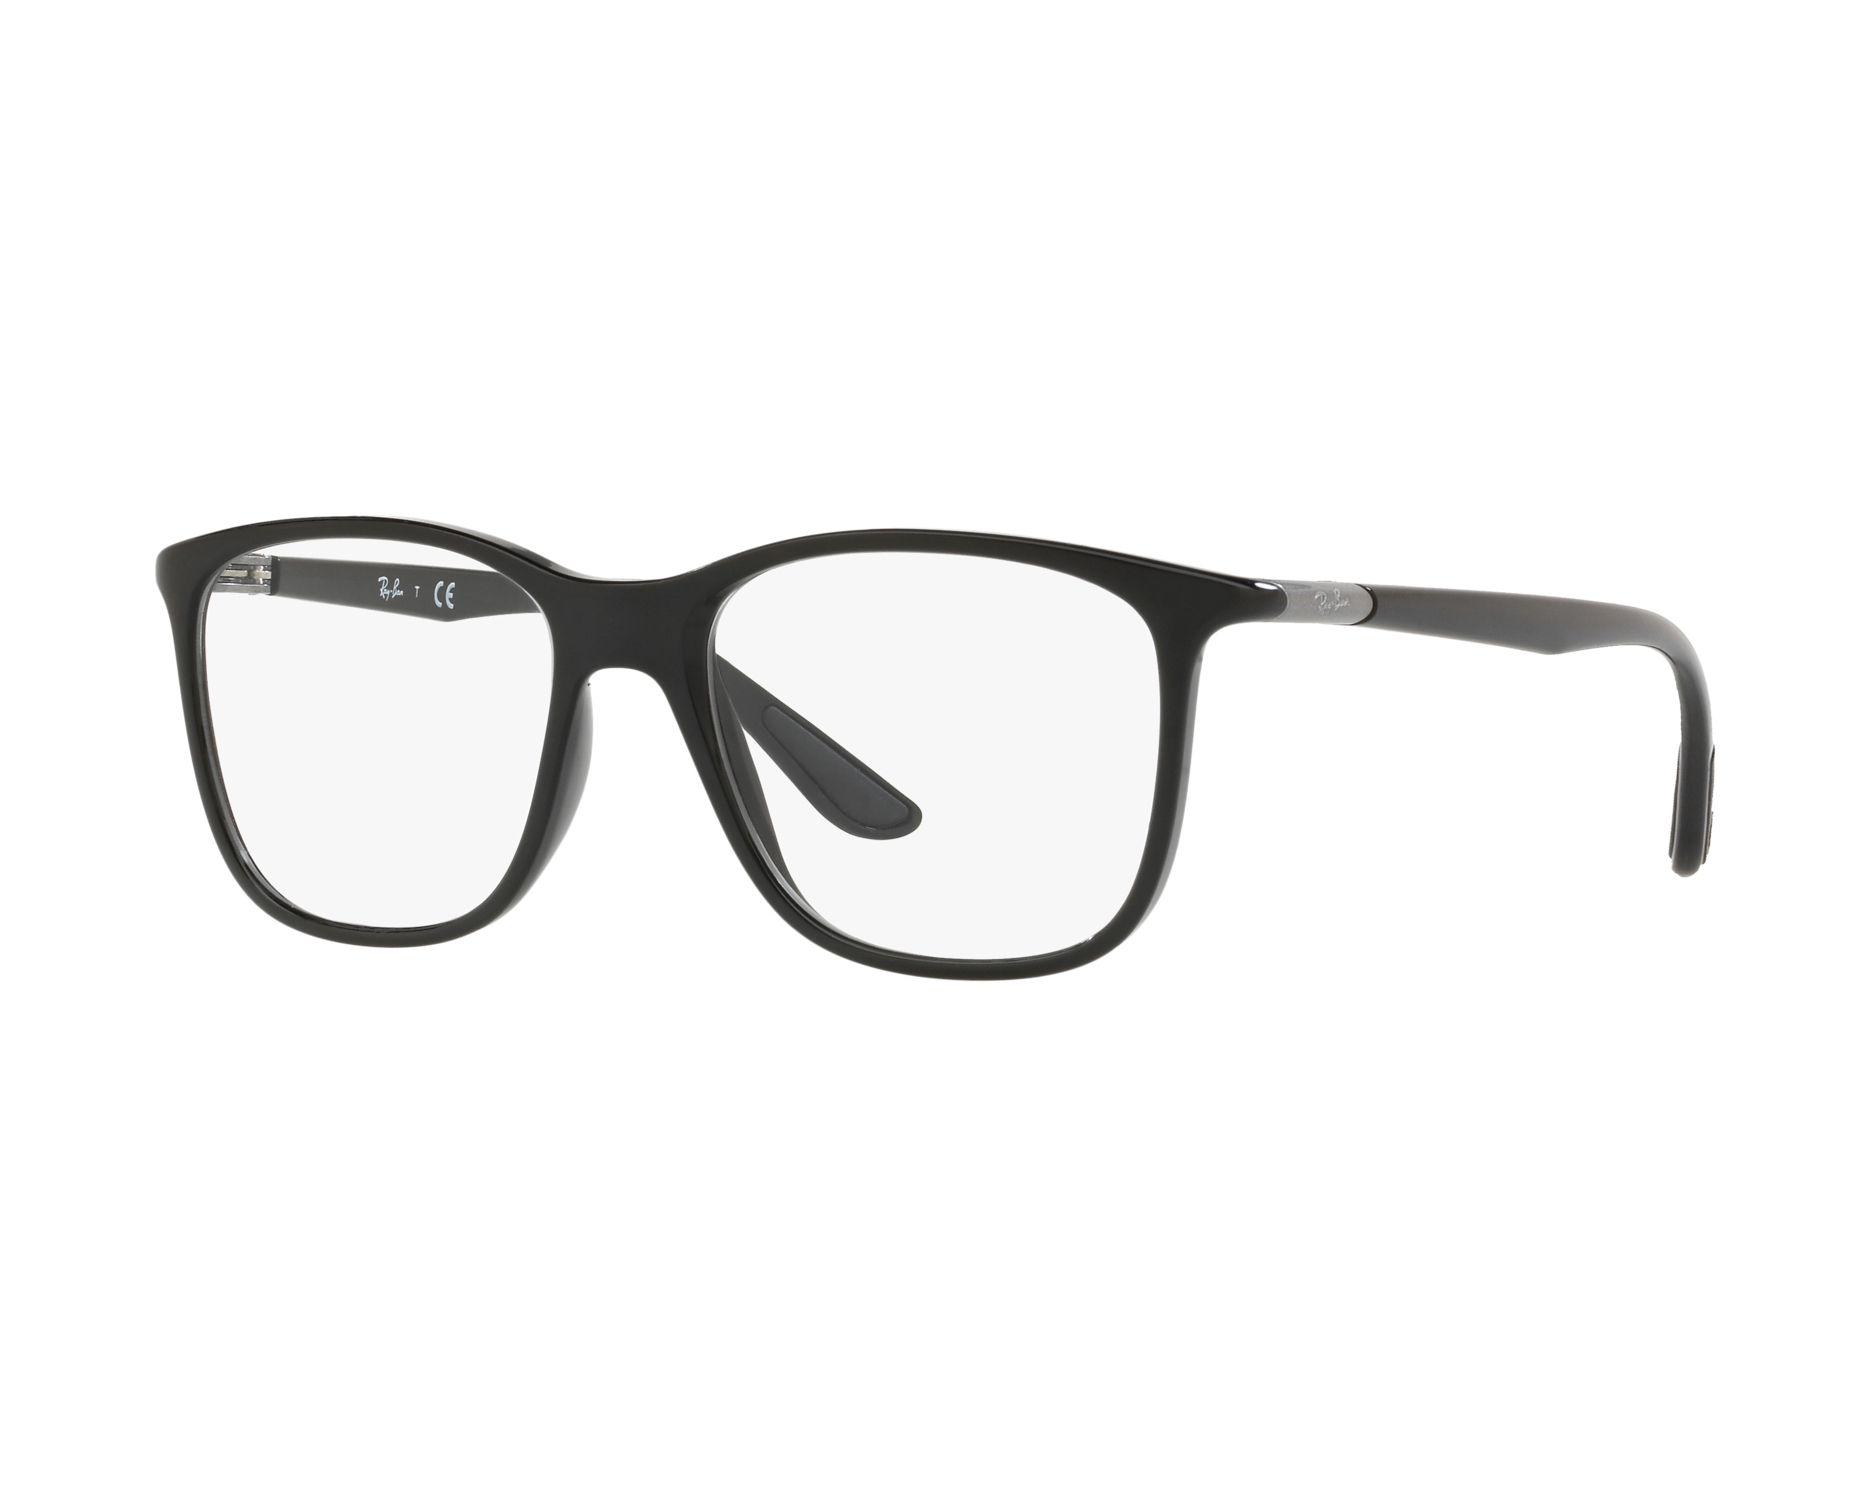 RAY BAN RAYBAN Brille » RX7143« braun 2012 braun zJXihTHd ...